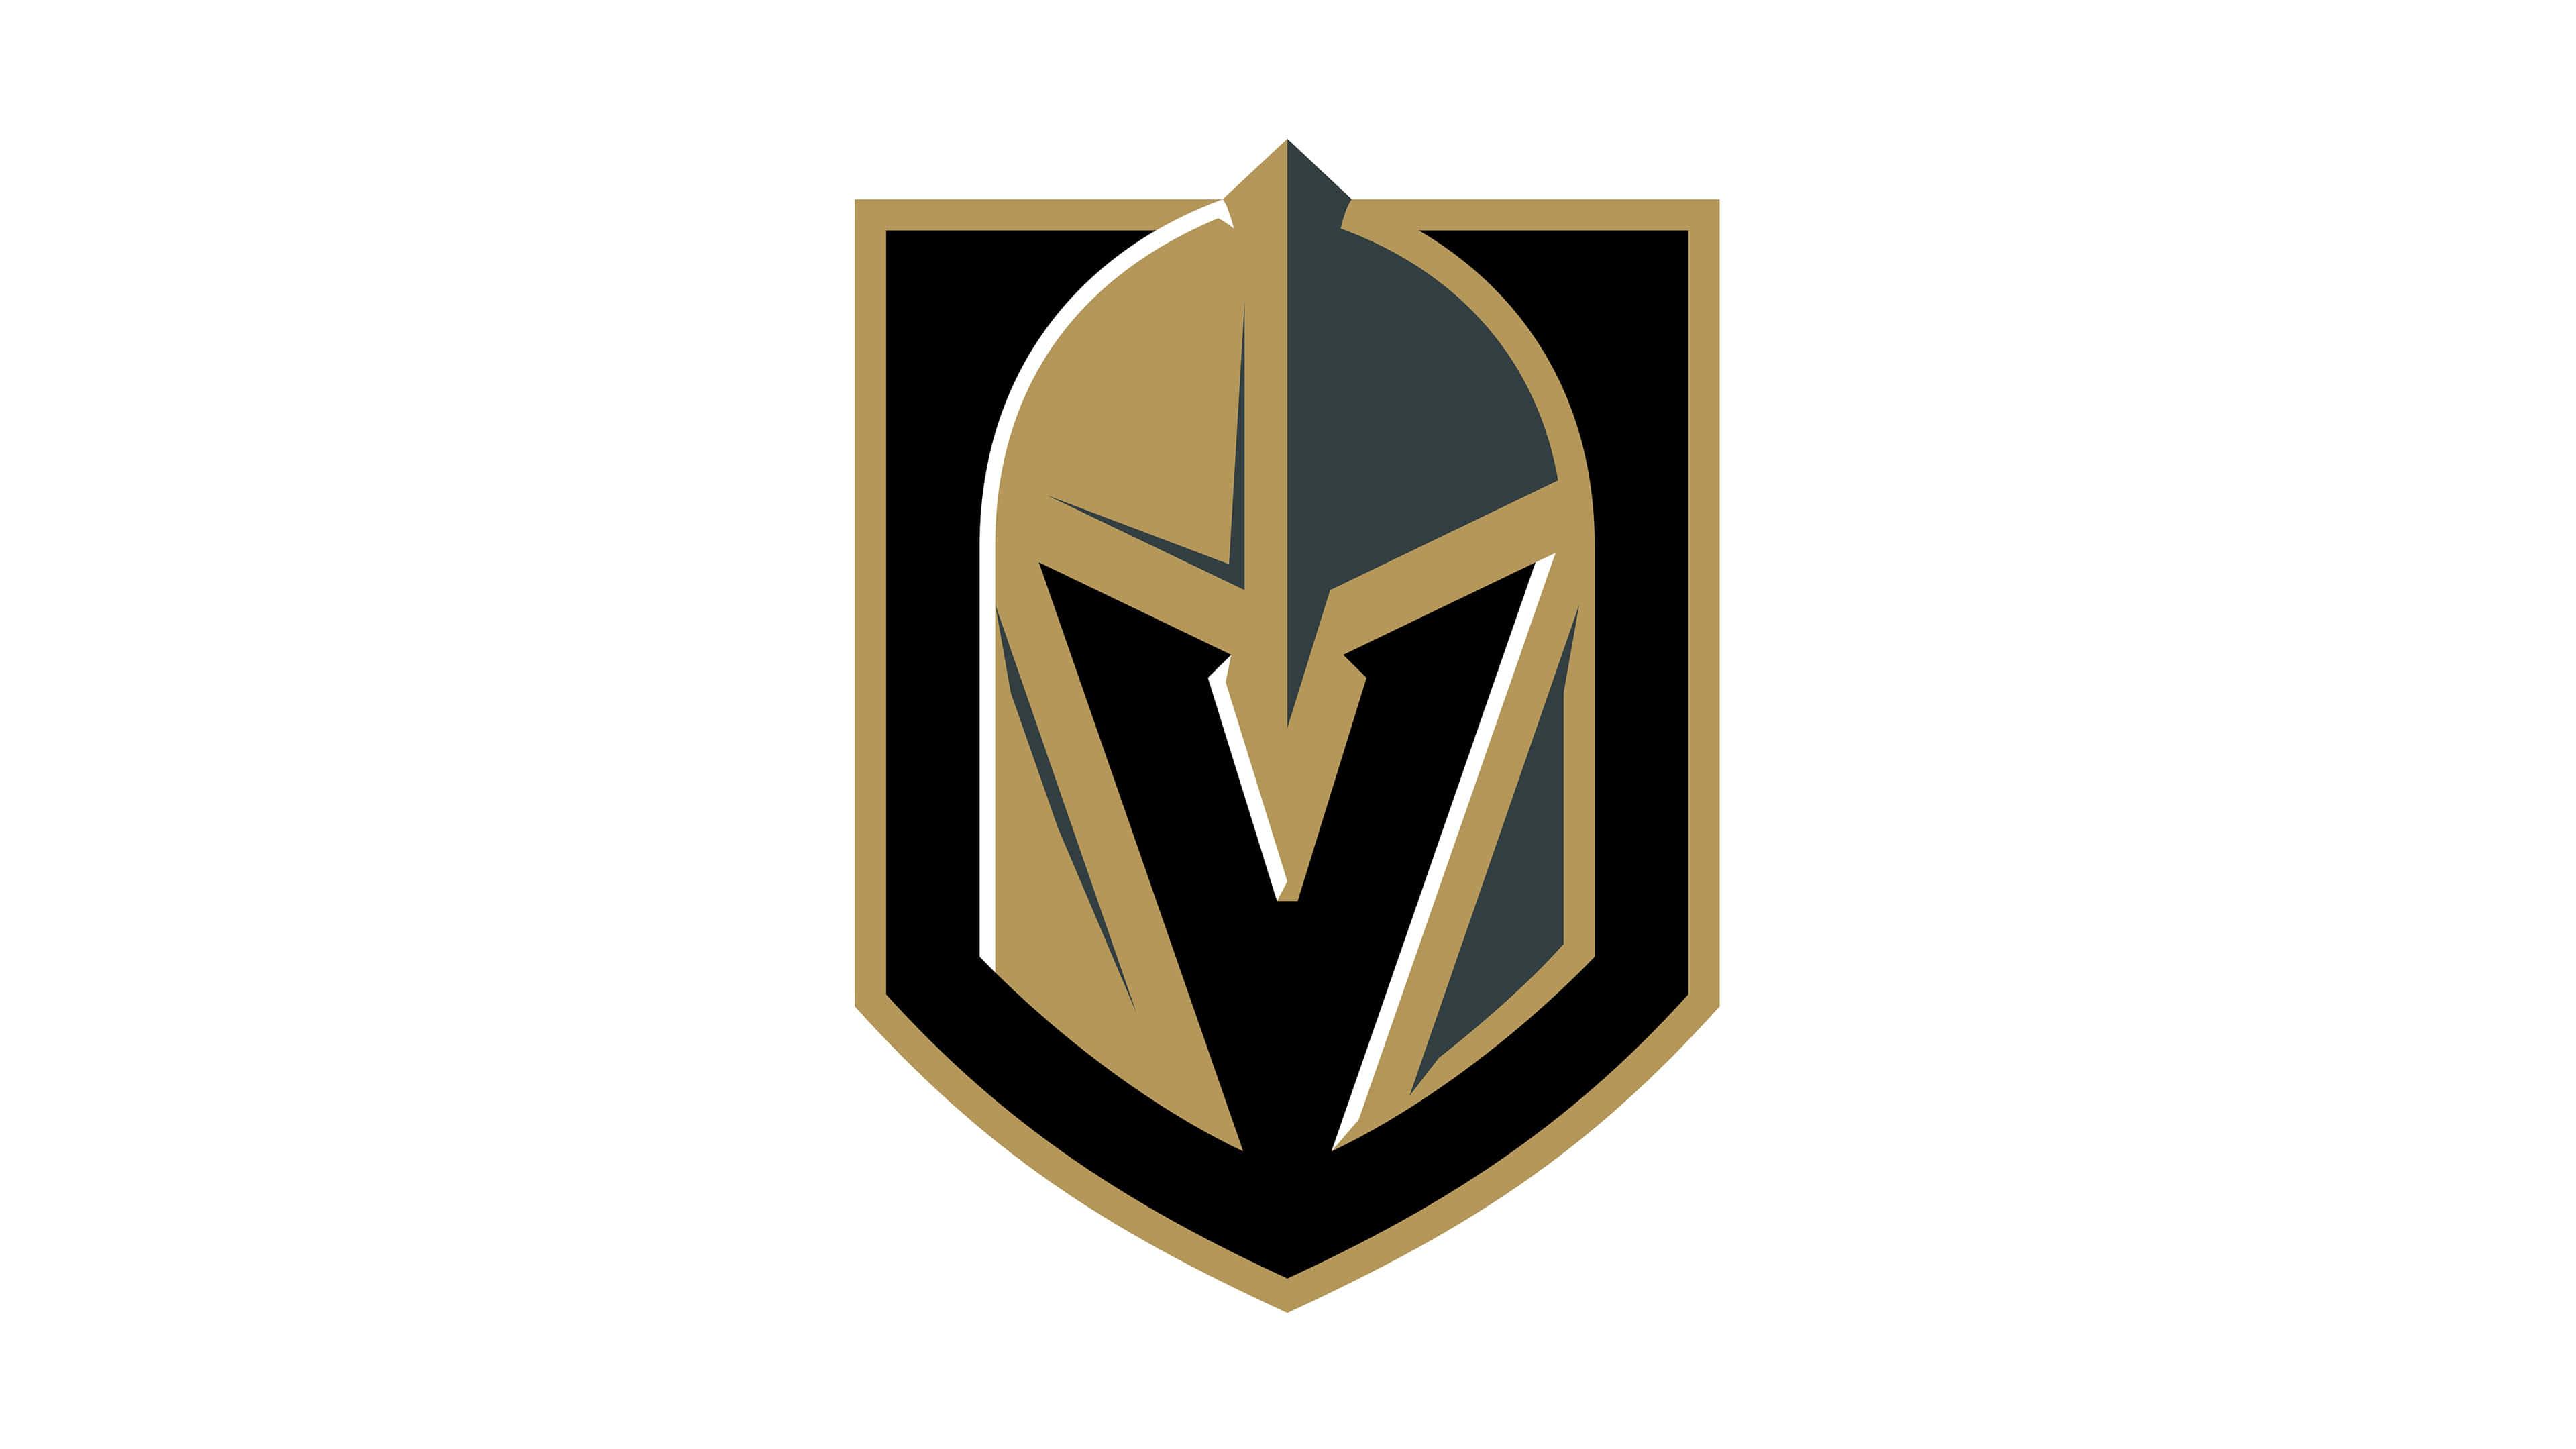 Vegas Golden Knights Nhl Logo Uhd 4k Wallpaper Pixelz